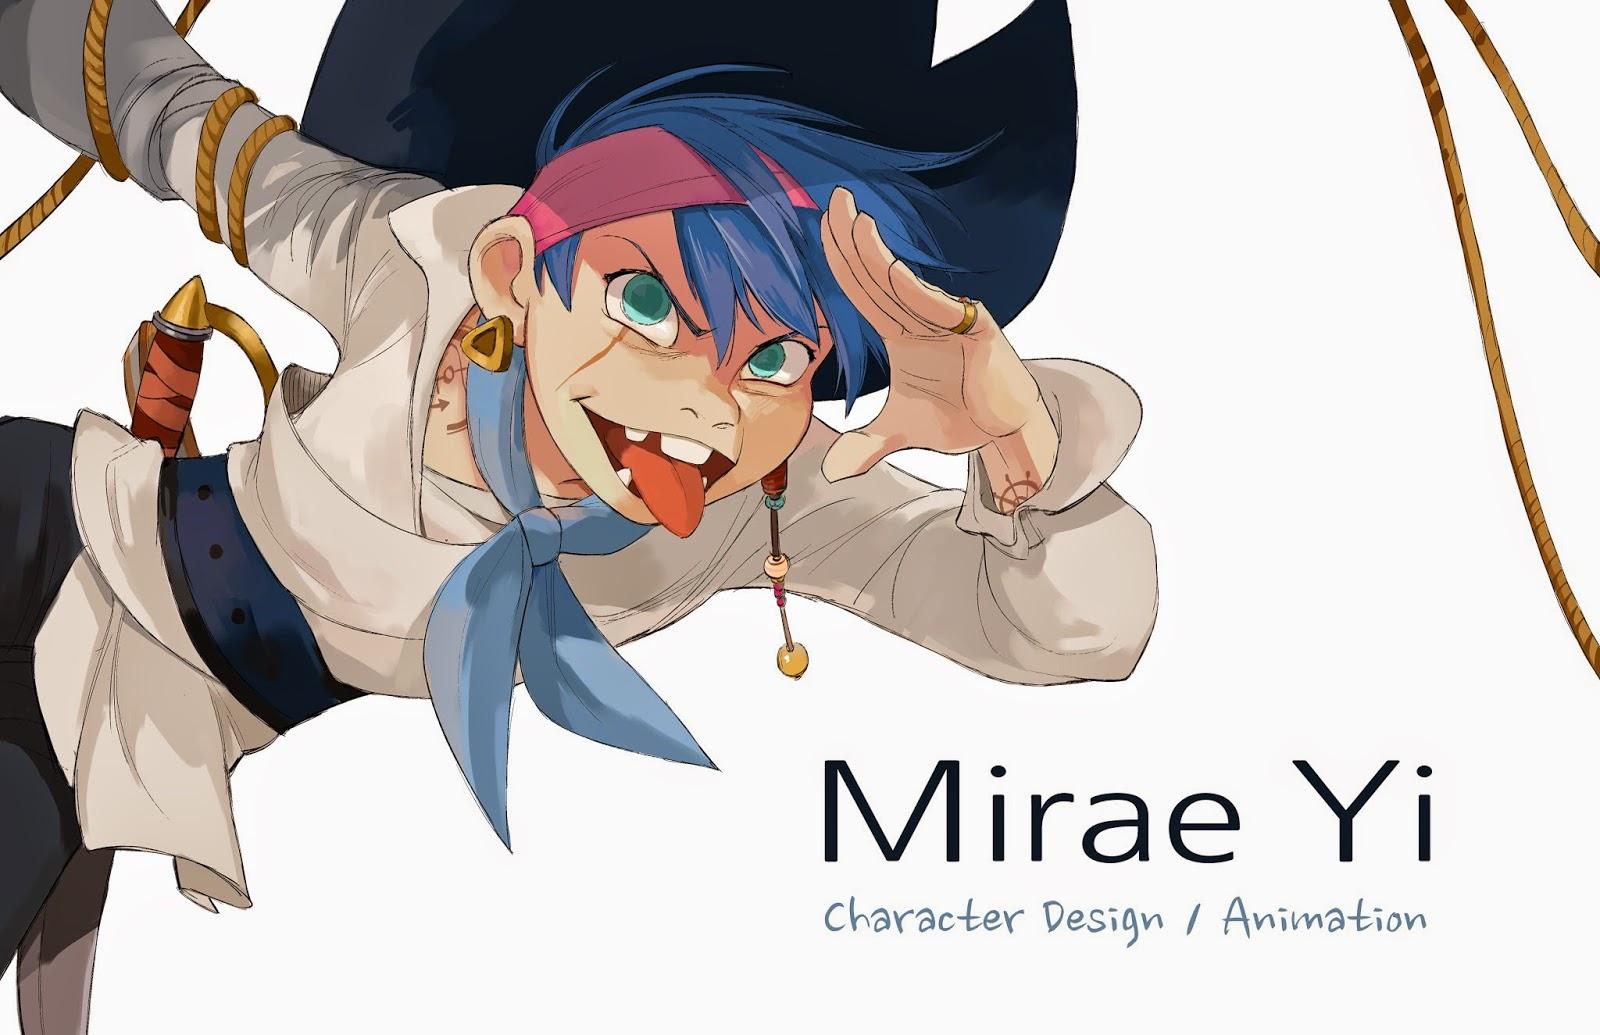 Animation Character Design Portfolio : Mirae works mirae yi character design portfolio